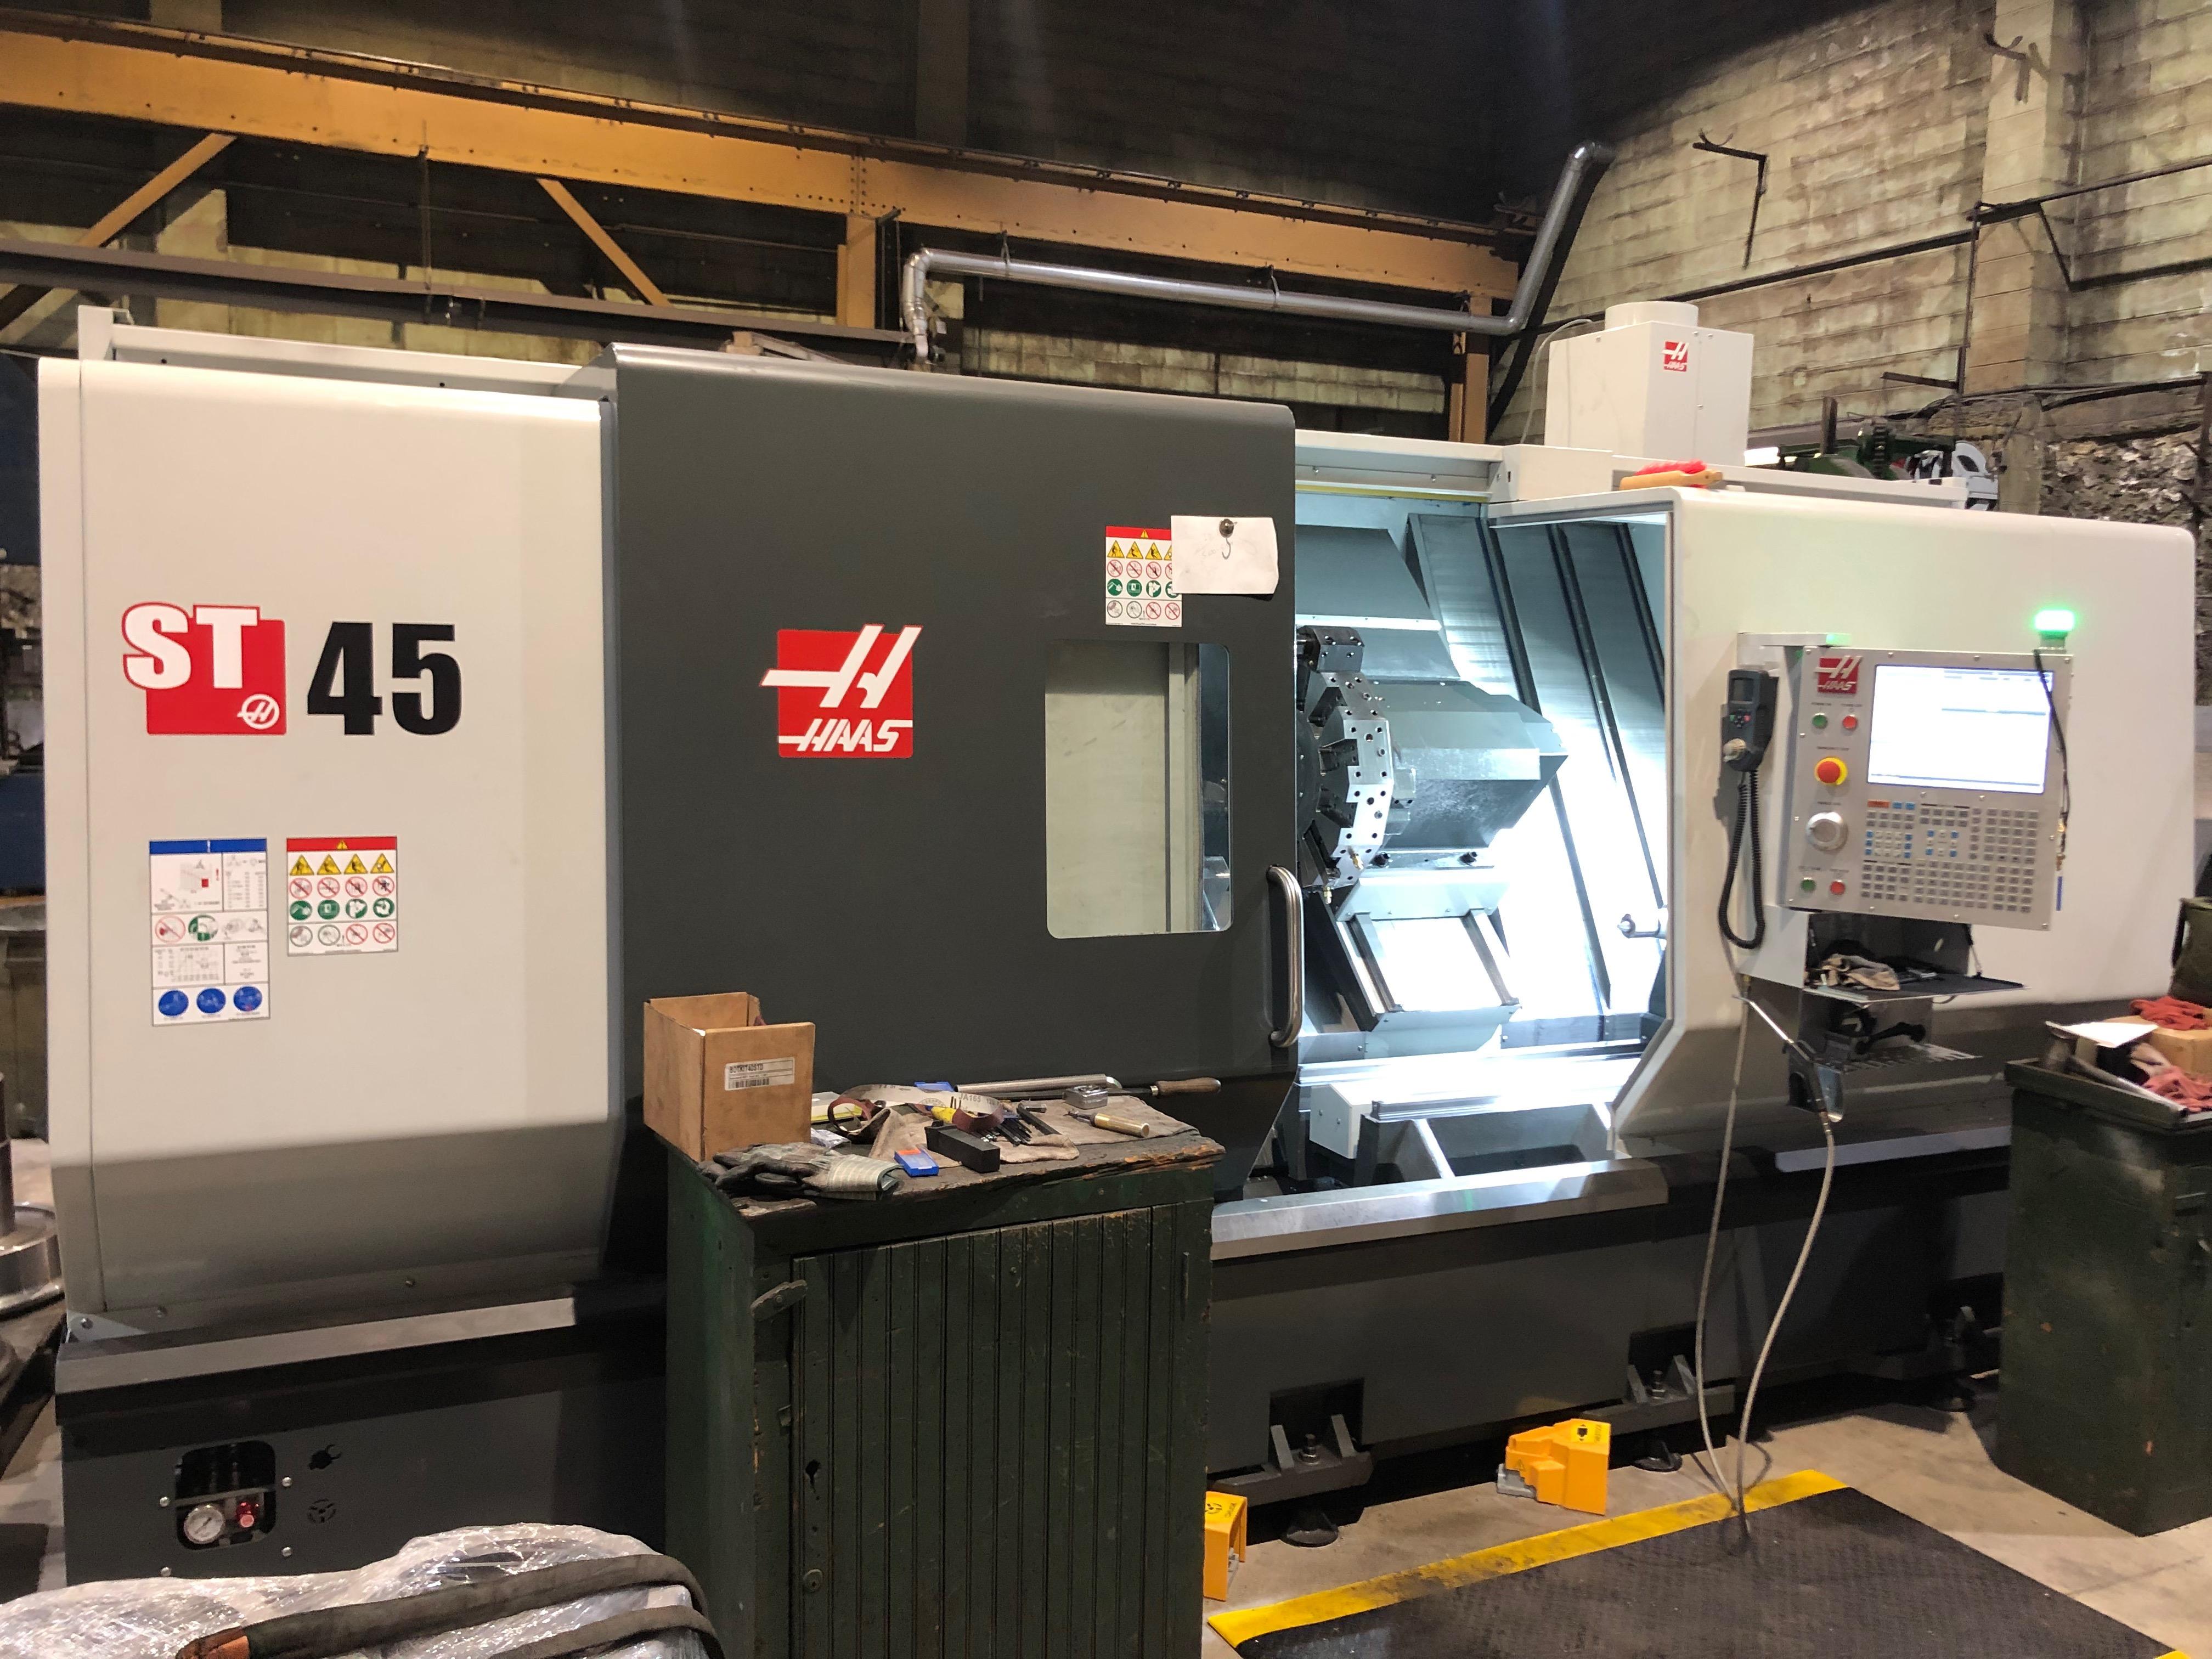 HAAS ST45 CNC Lathe